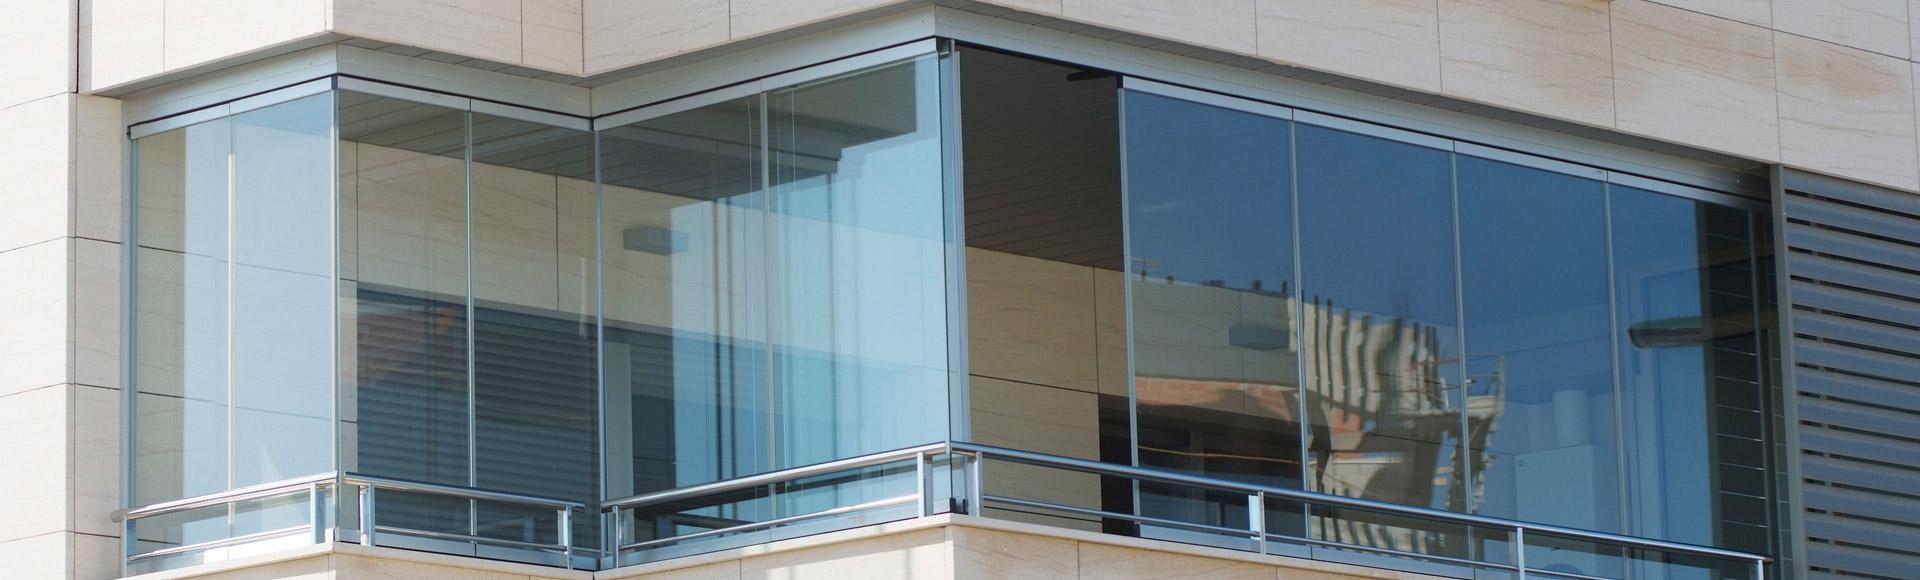 Cerramientos de terrazas pergolas y porches pergoglass - Cerrar balcon ...